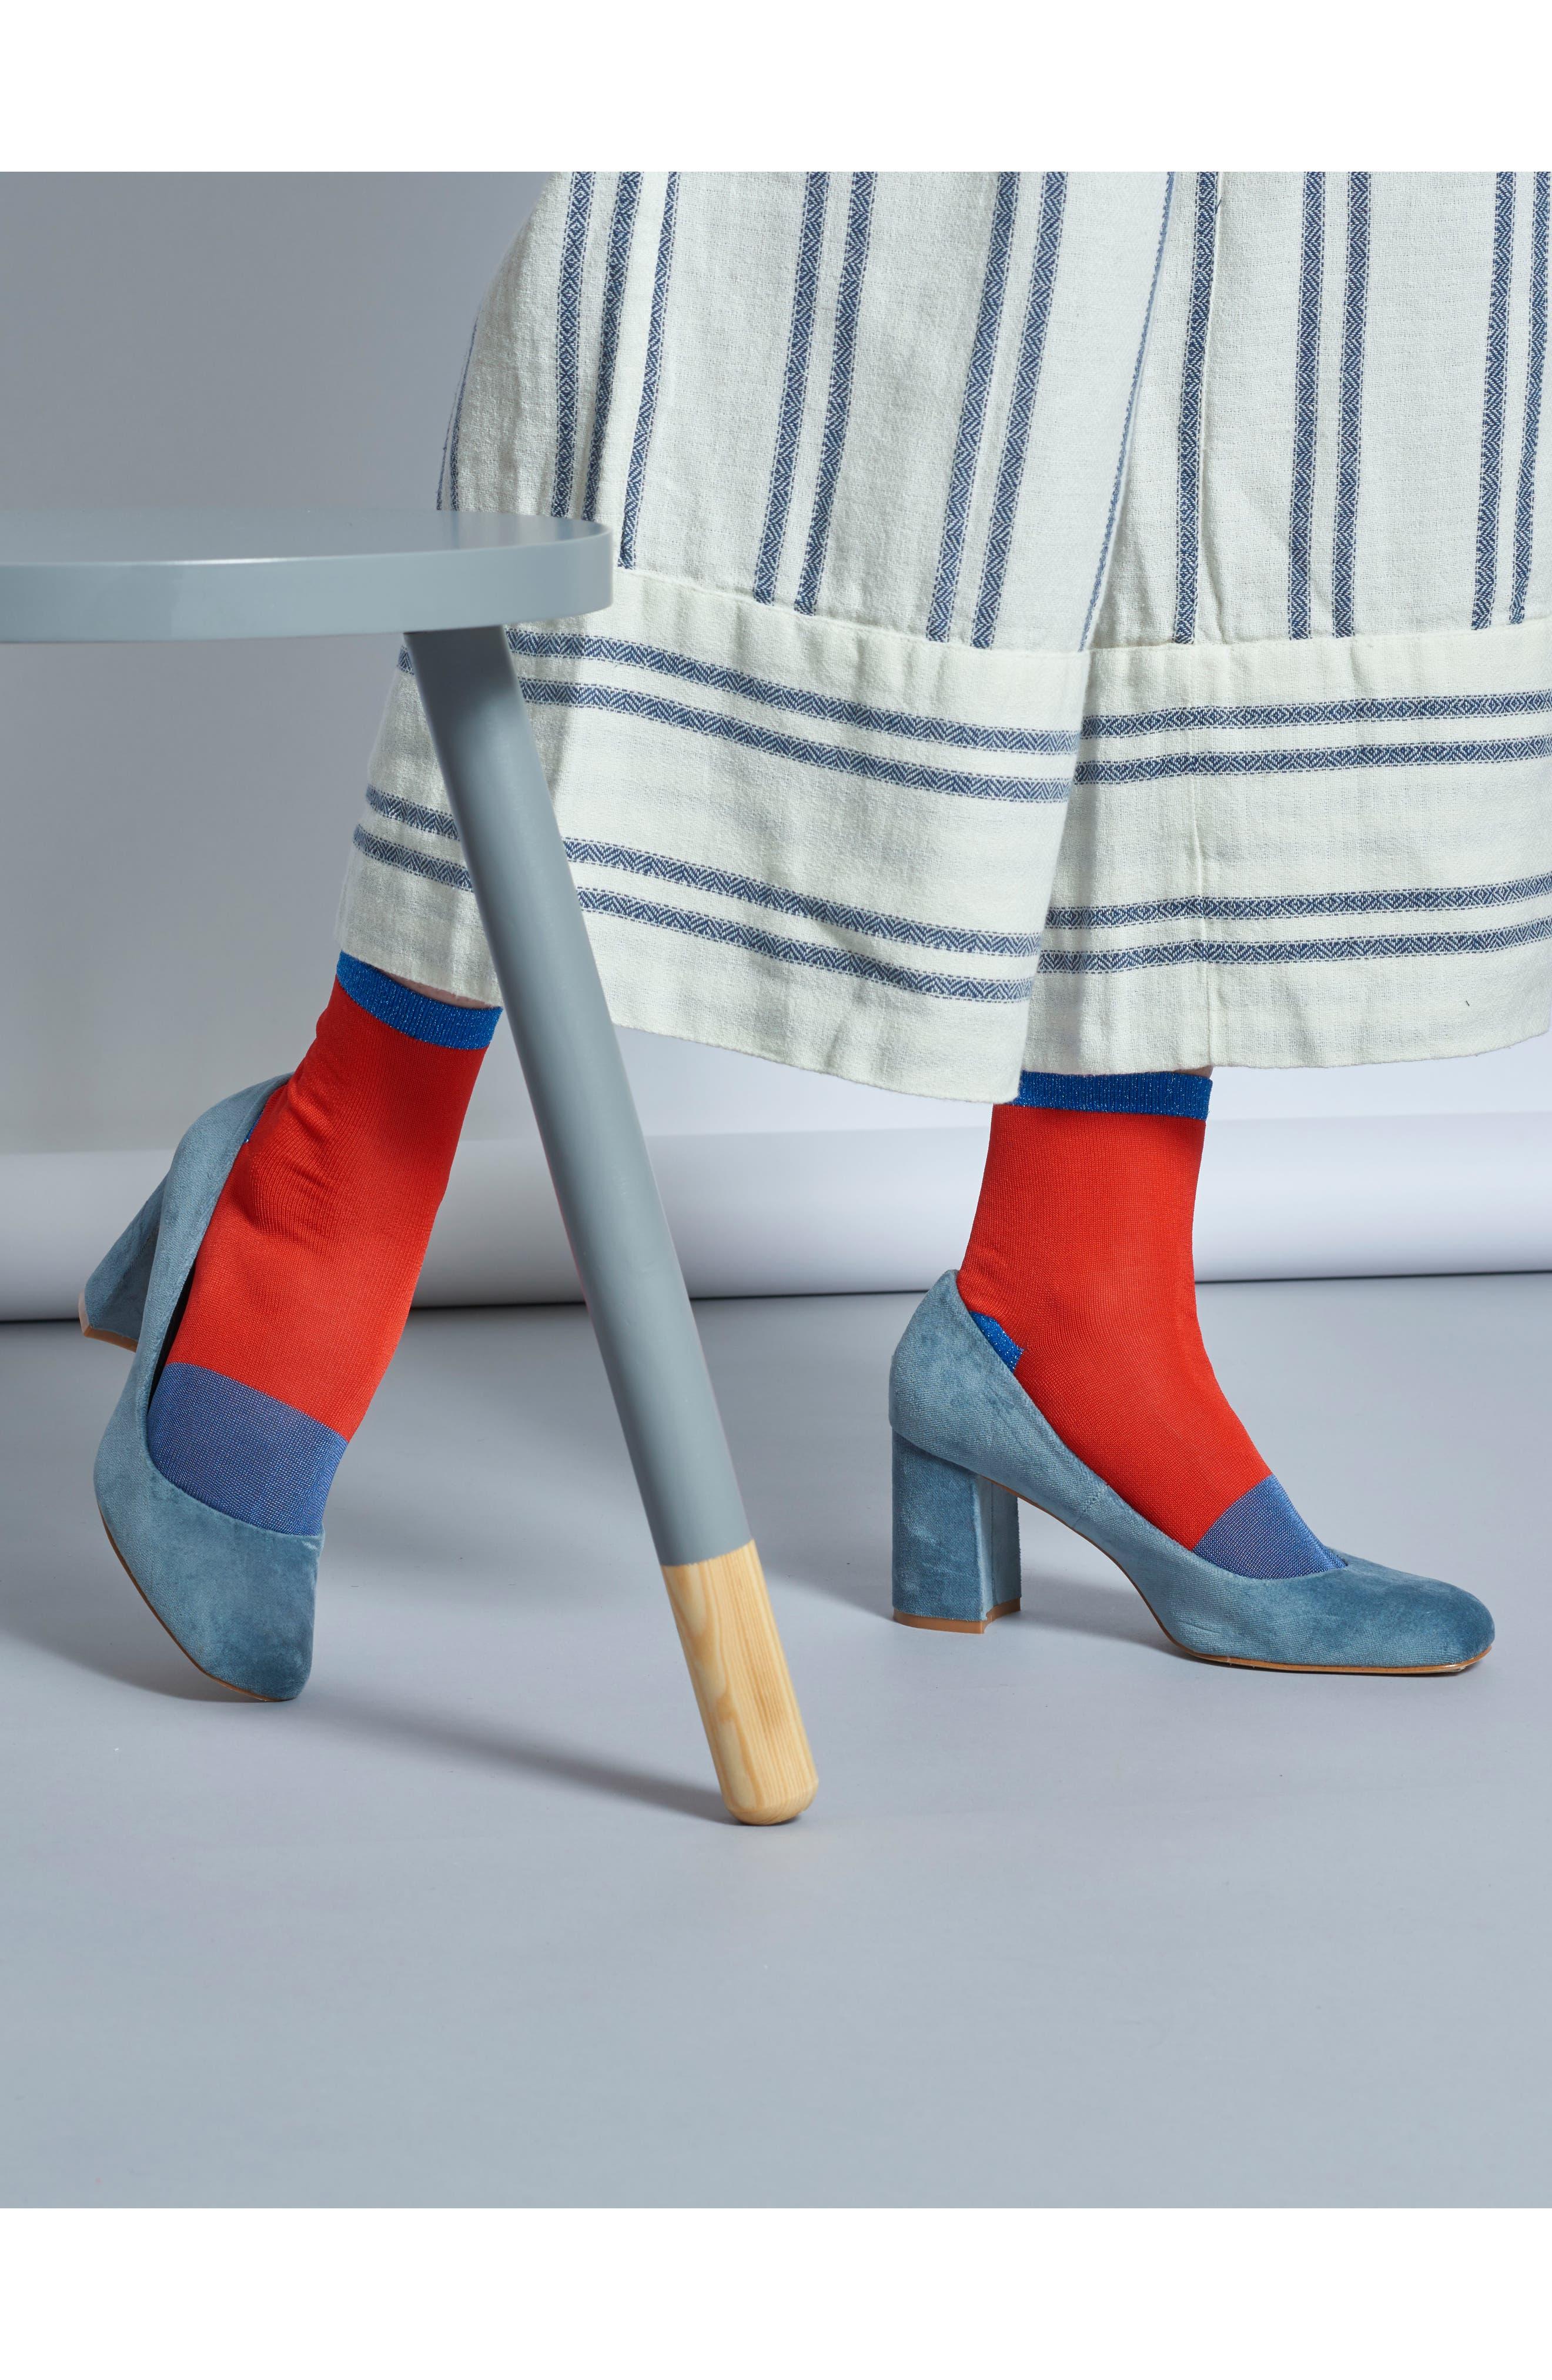 Liza Sparkle Ankle Socks,                             Alternate thumbnail 4, color,                             Red